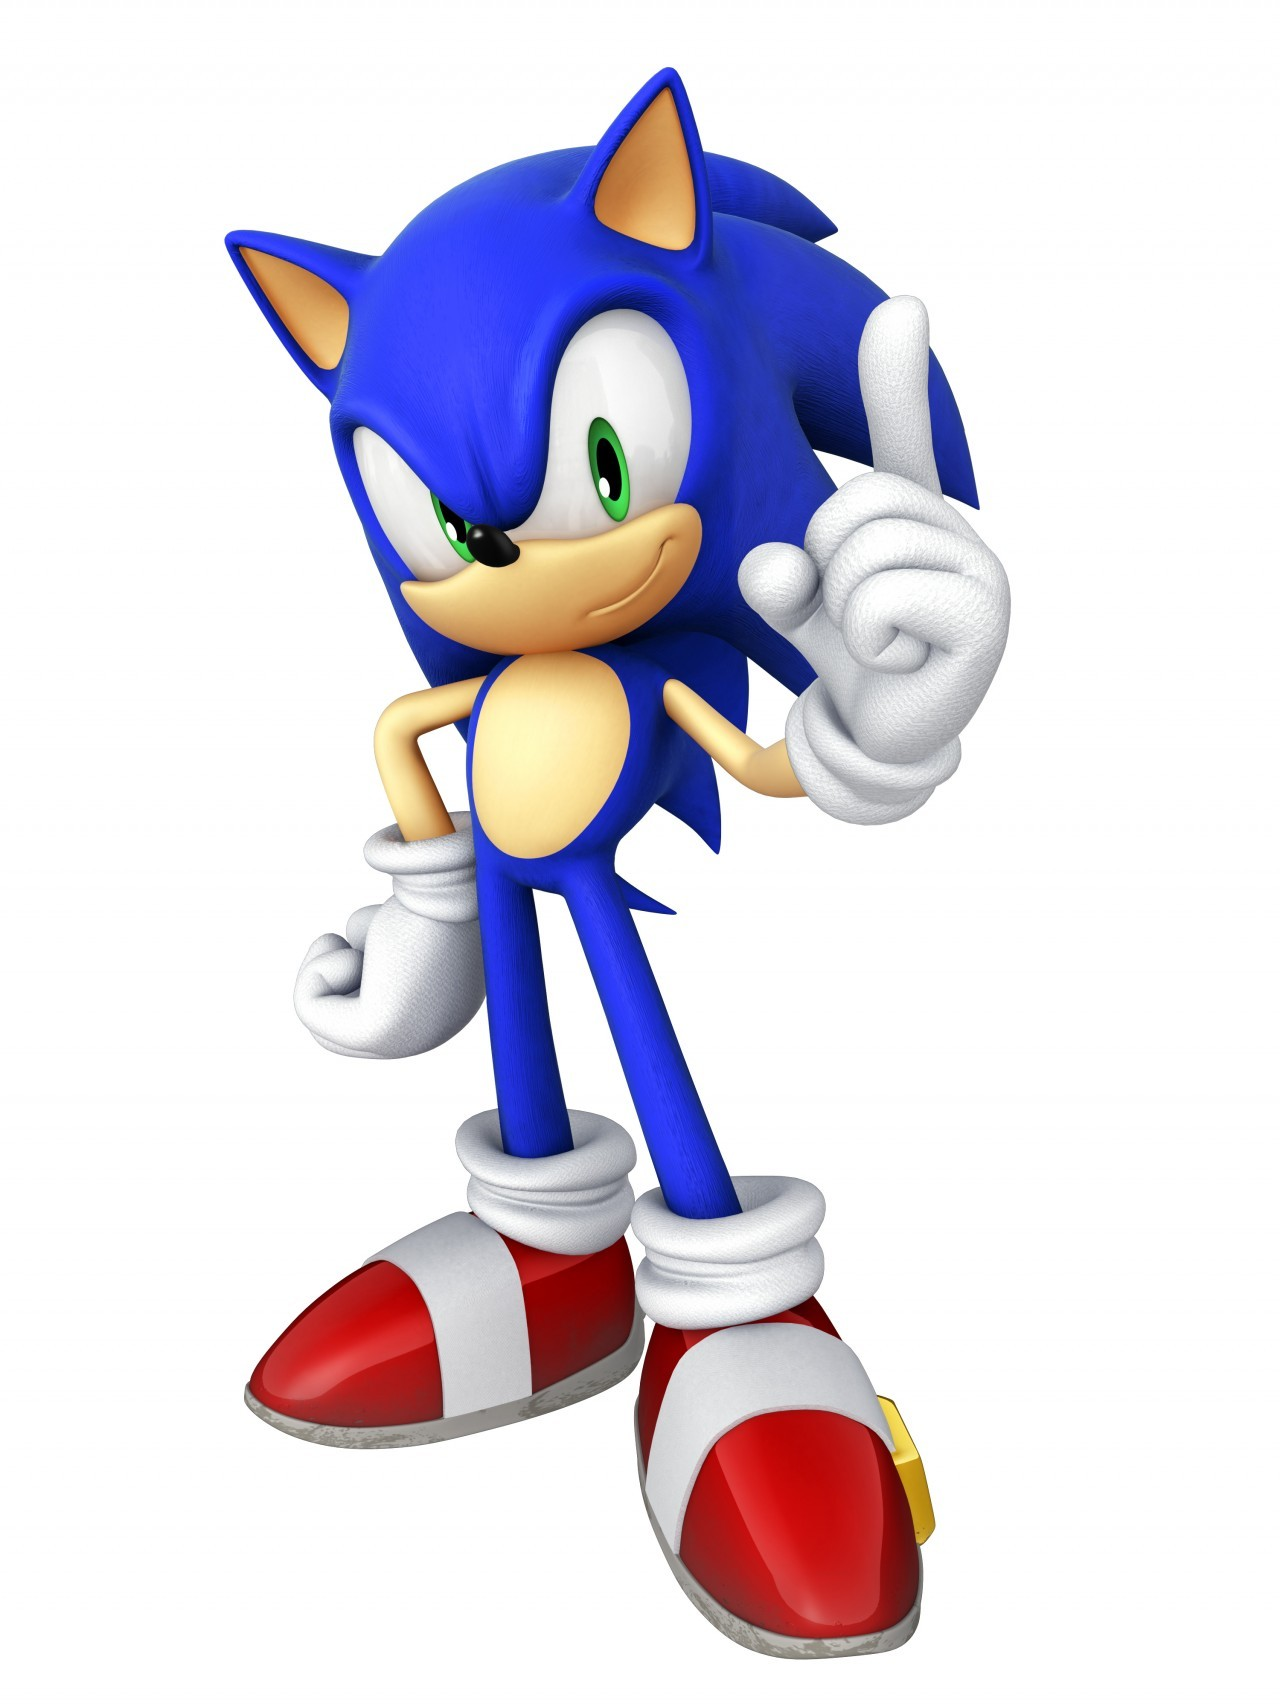 sonic the hedgehog 4 episode 1 apk free